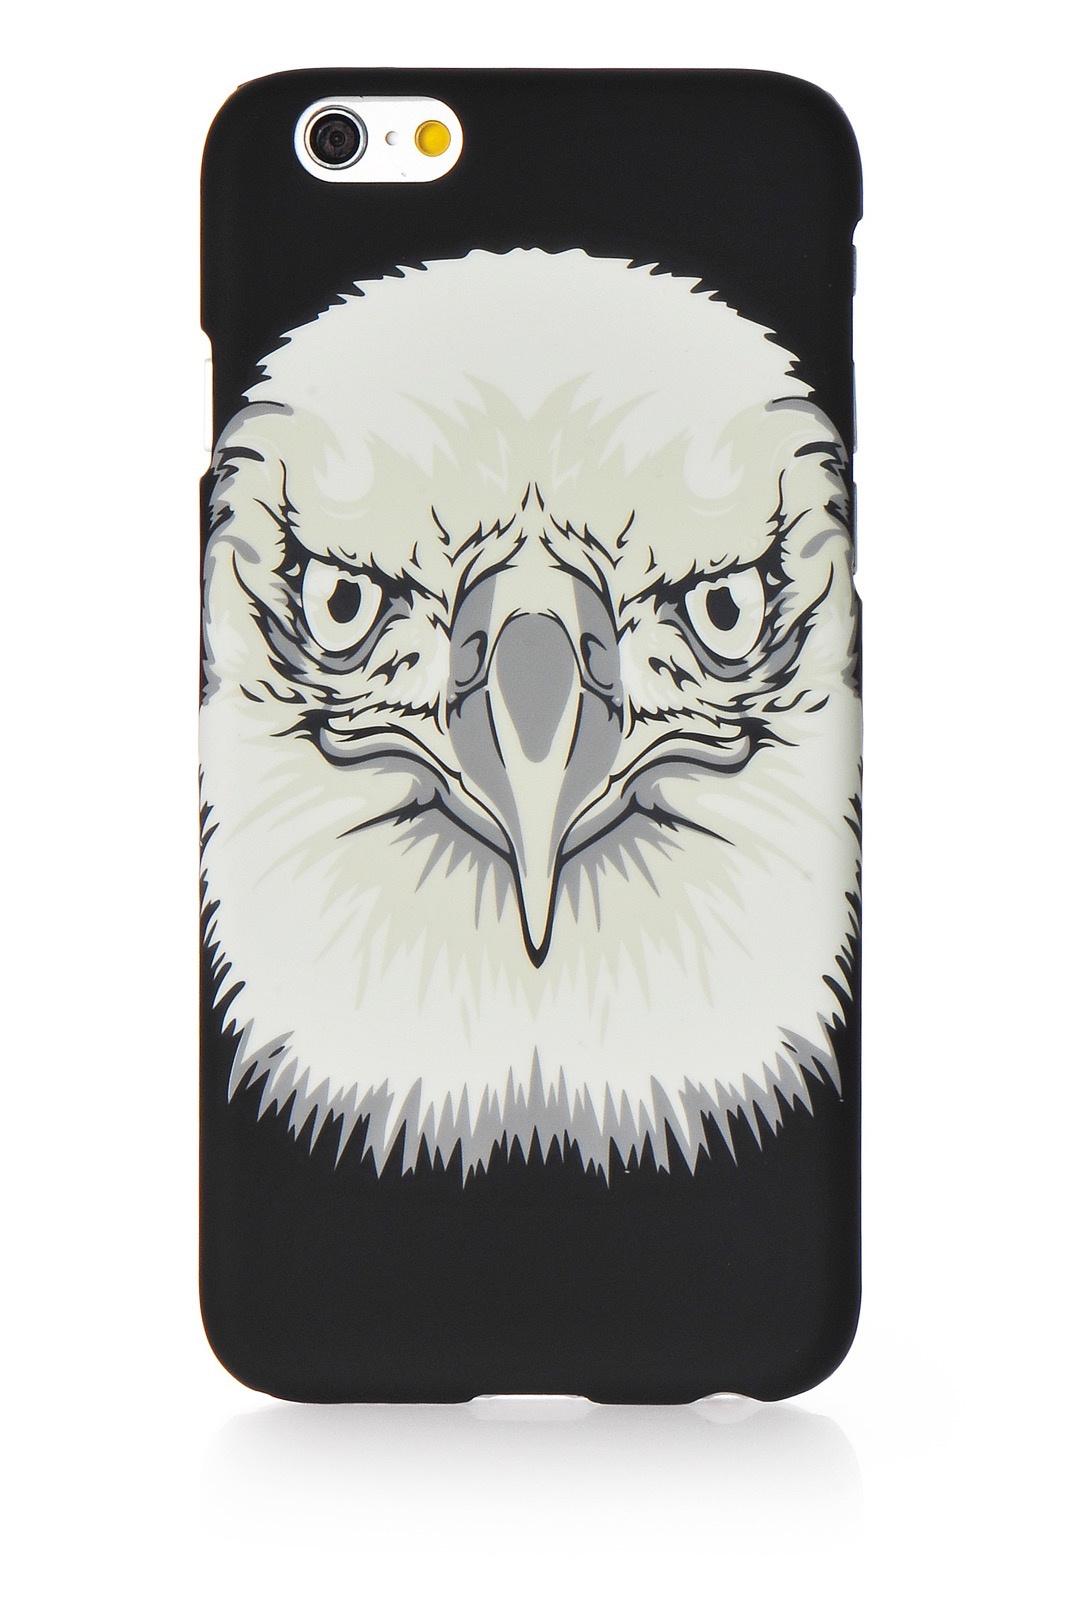 "Чехол для сотового телефона Gurdini Animal пластик soft touch стиль 1 для Apple iPhone 6 Plus/6S Plus 5.5"", черный"